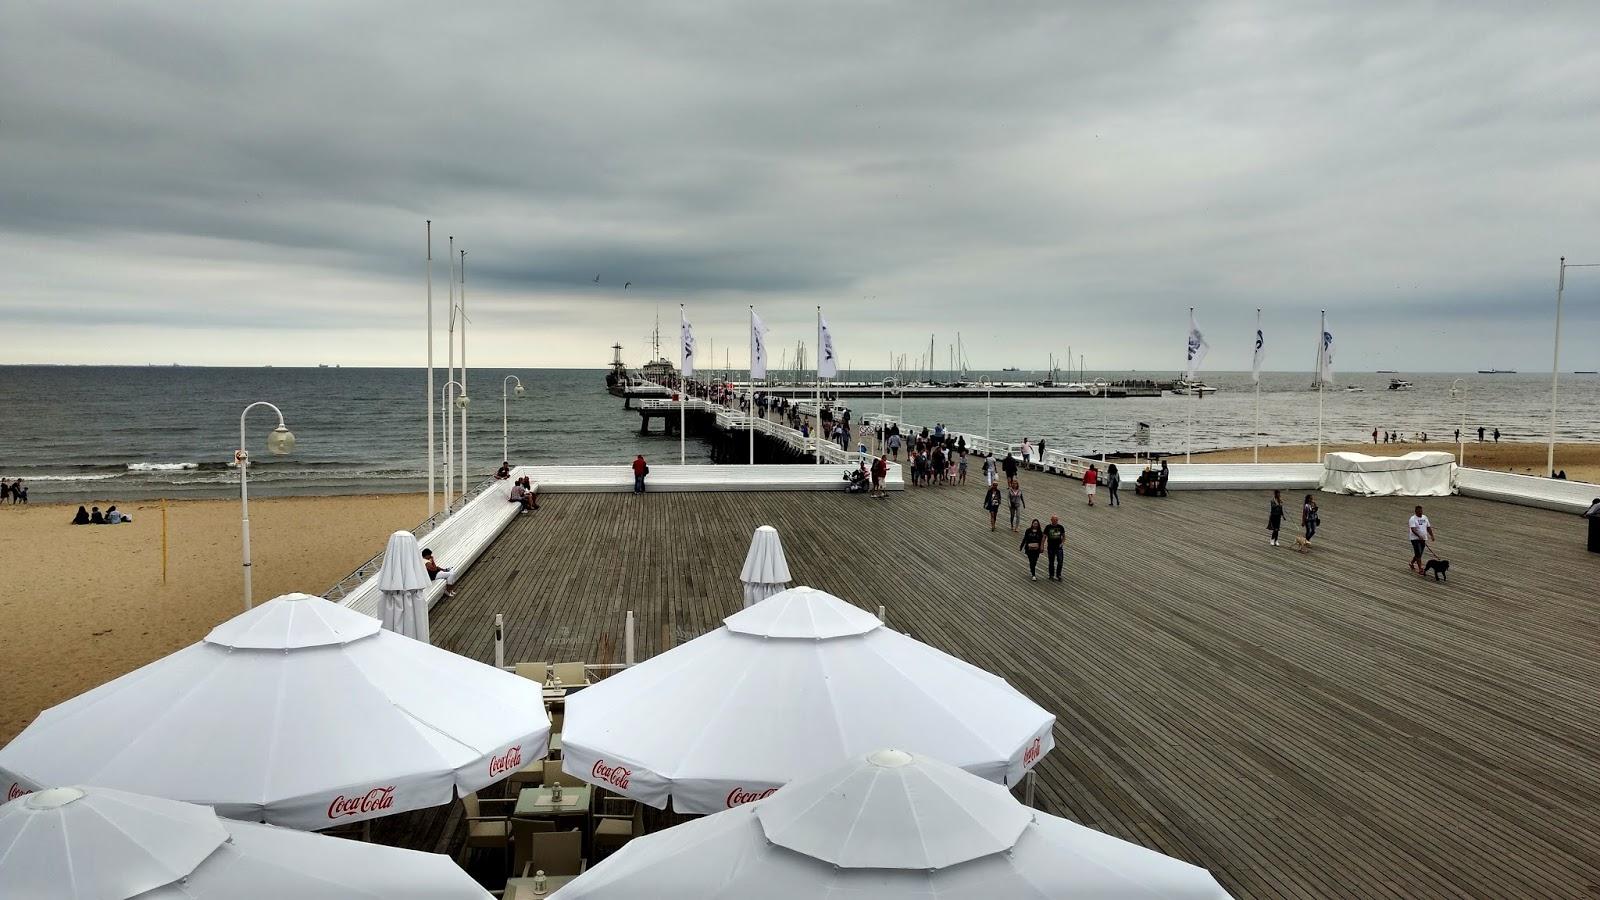 morze | niebo | parasole | widok | krajobraz | molo | sopot